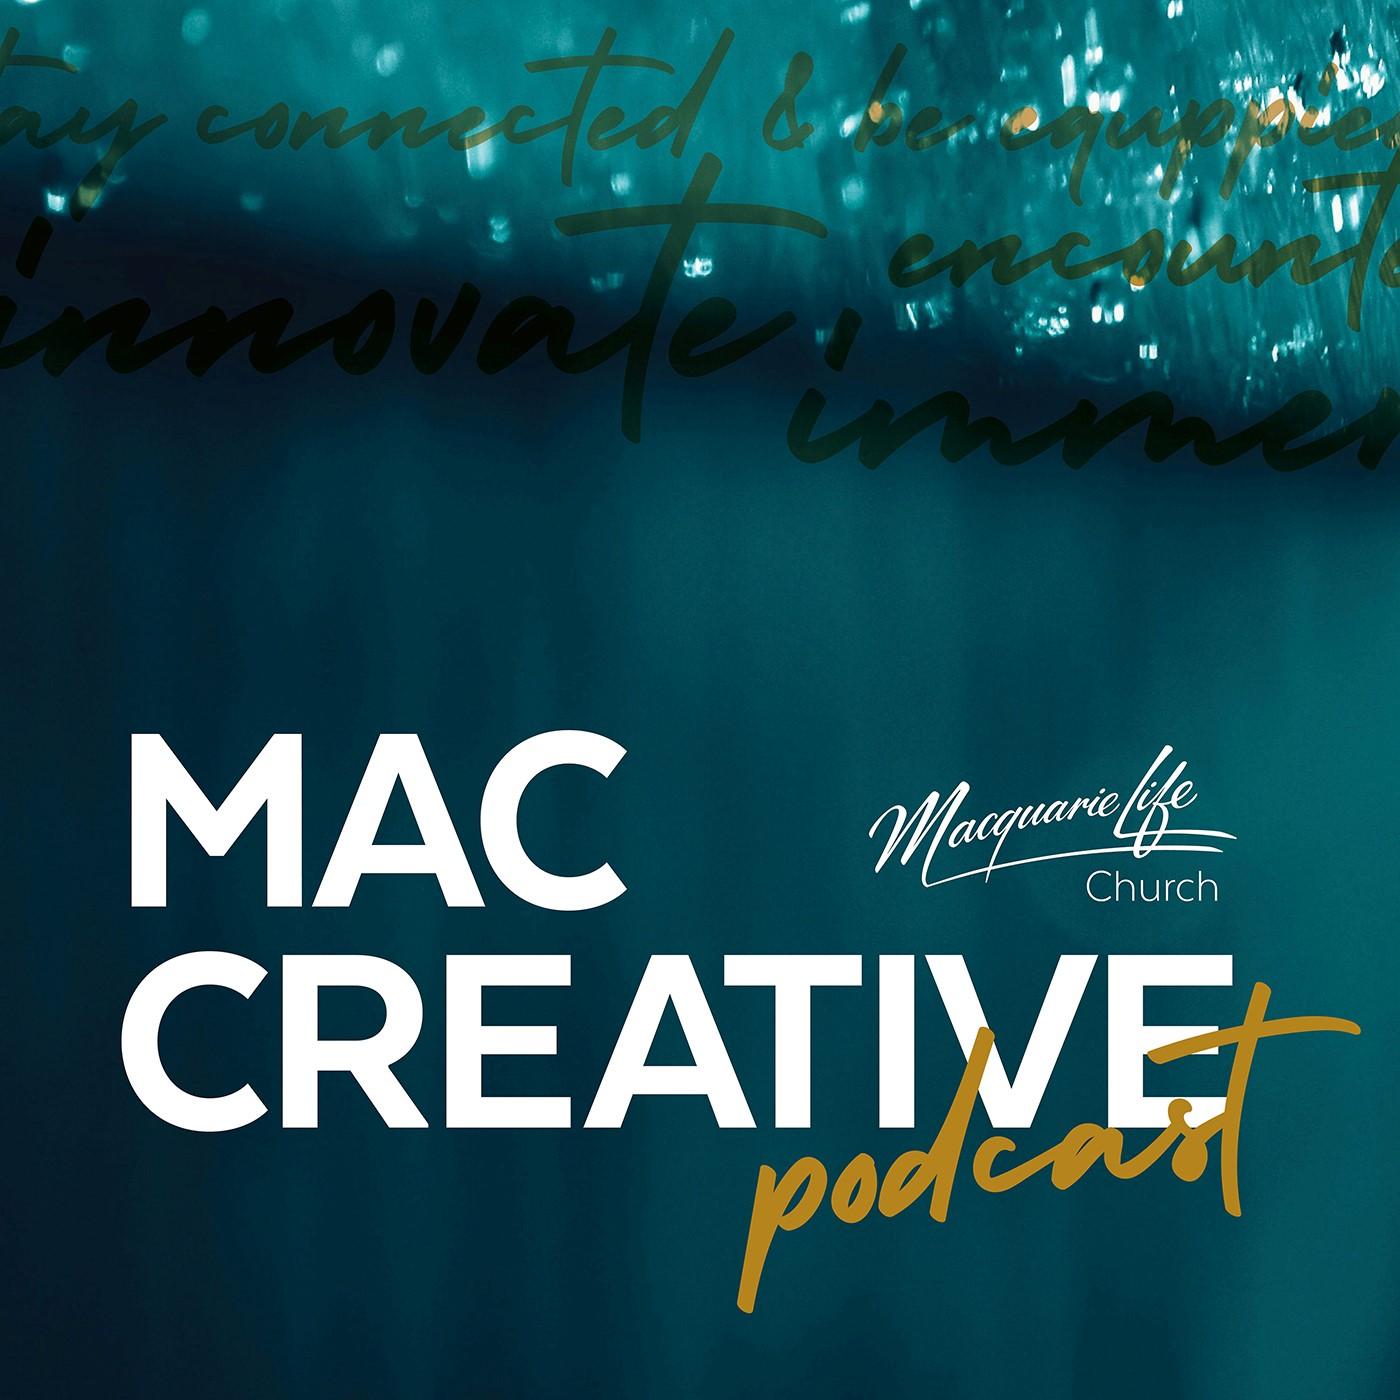 Mac Creative Podcast - We're still here!